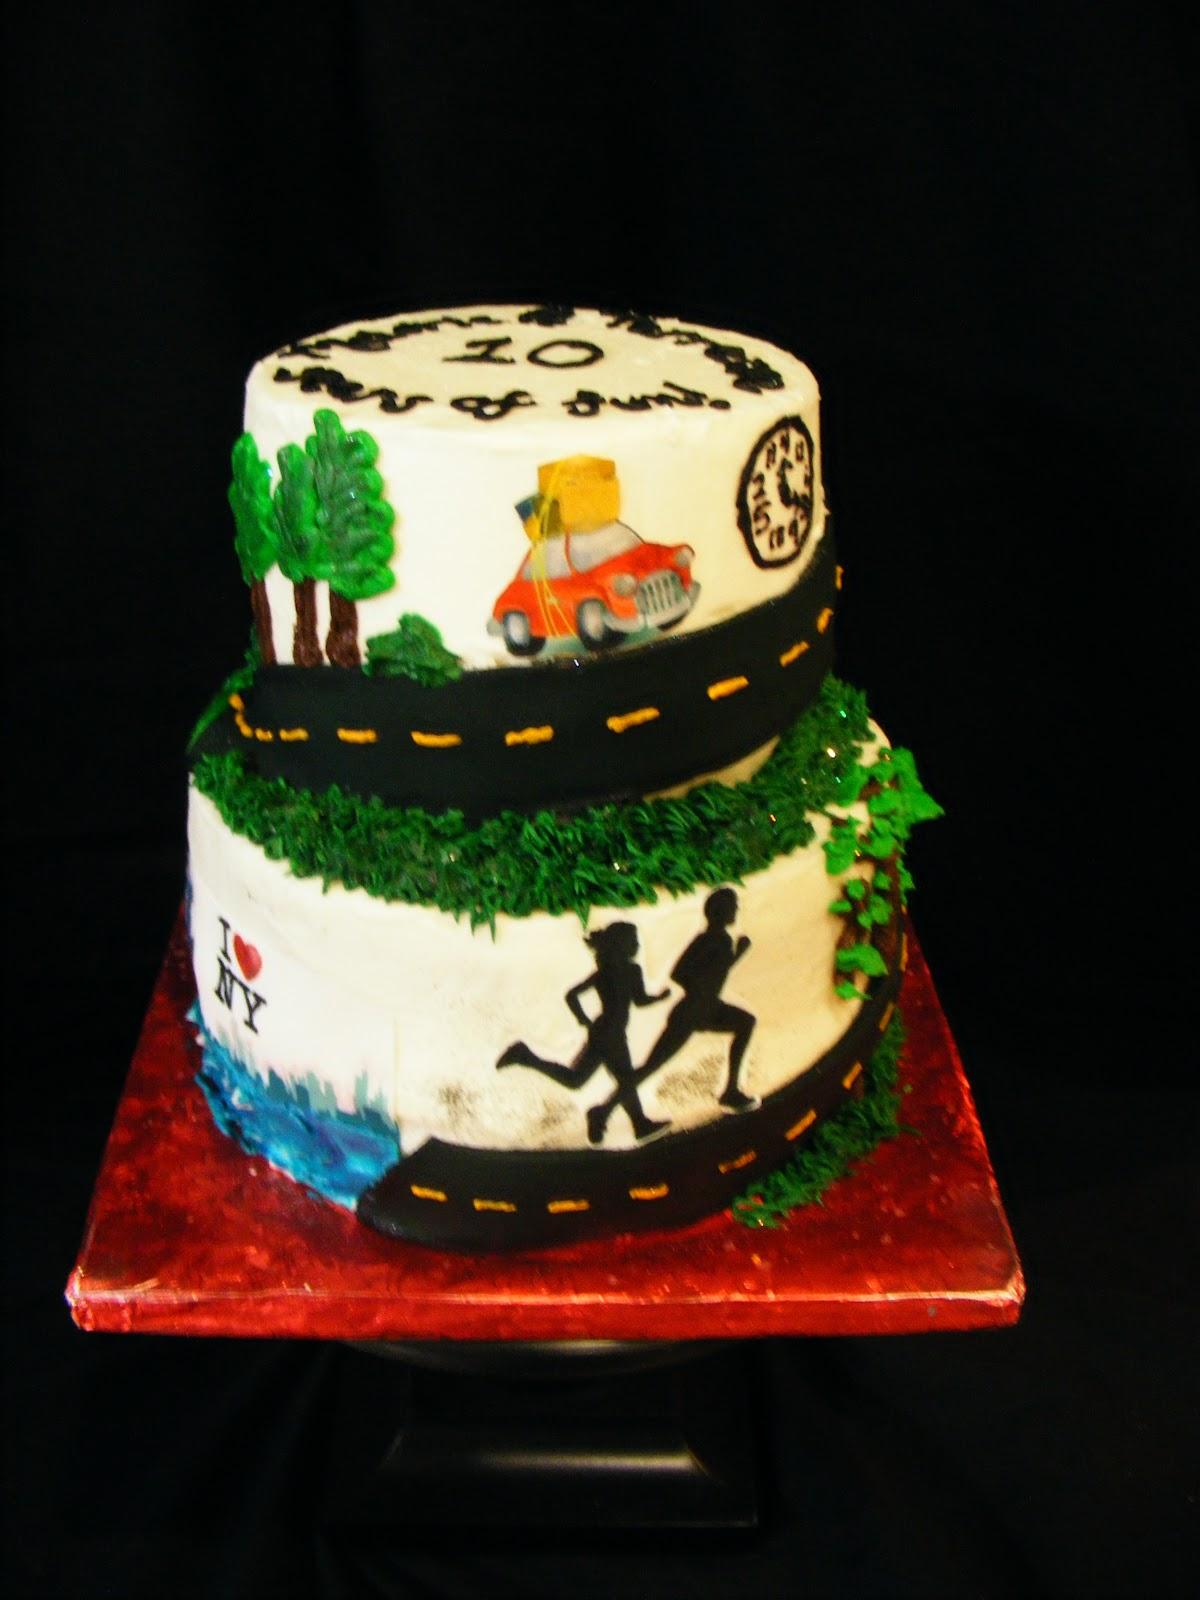 PattiCakes 10th Anniversary Cake